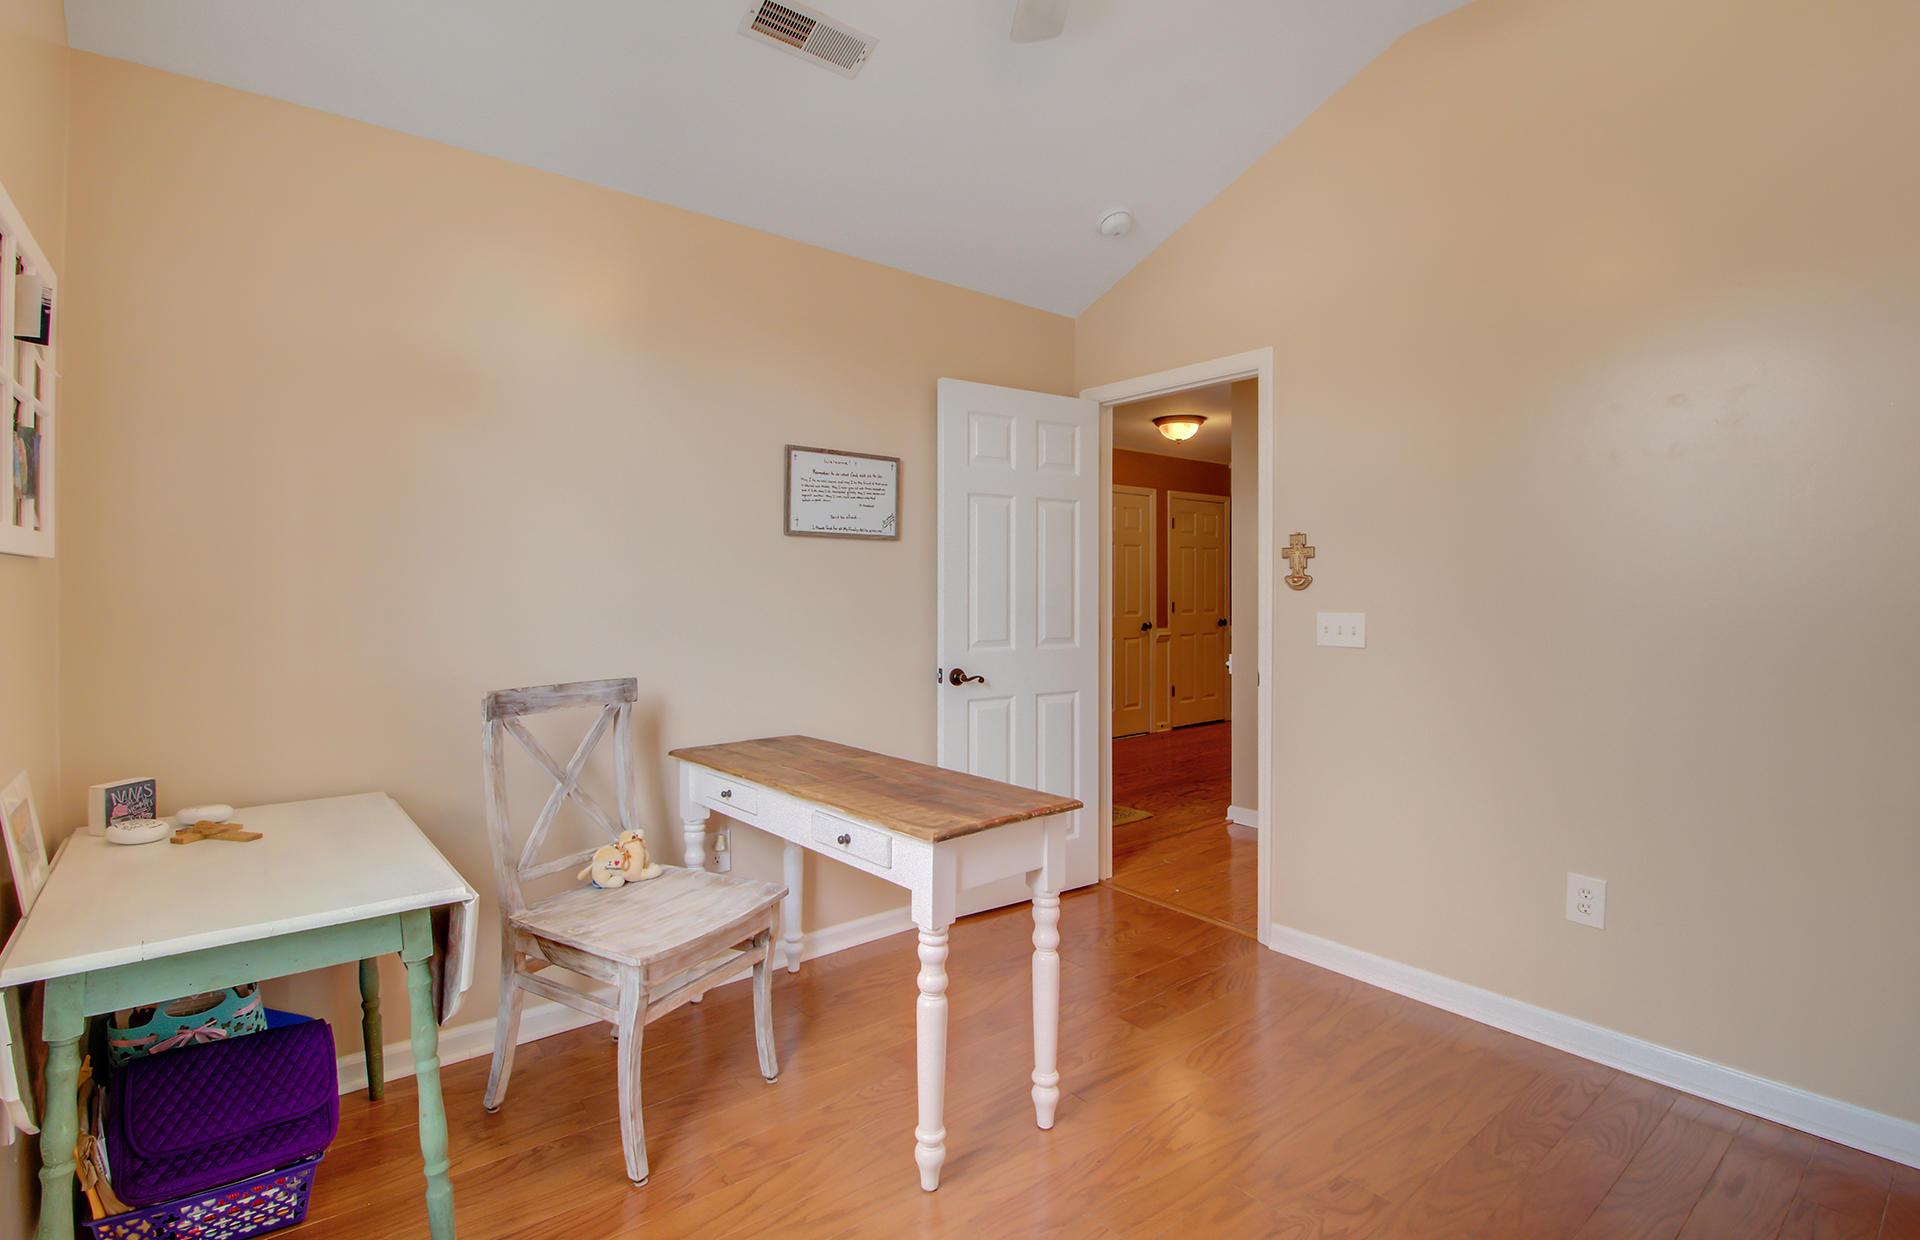 Park West Homes For Sale - 1500 Wellesley, Mount Pleasant, SC - 14